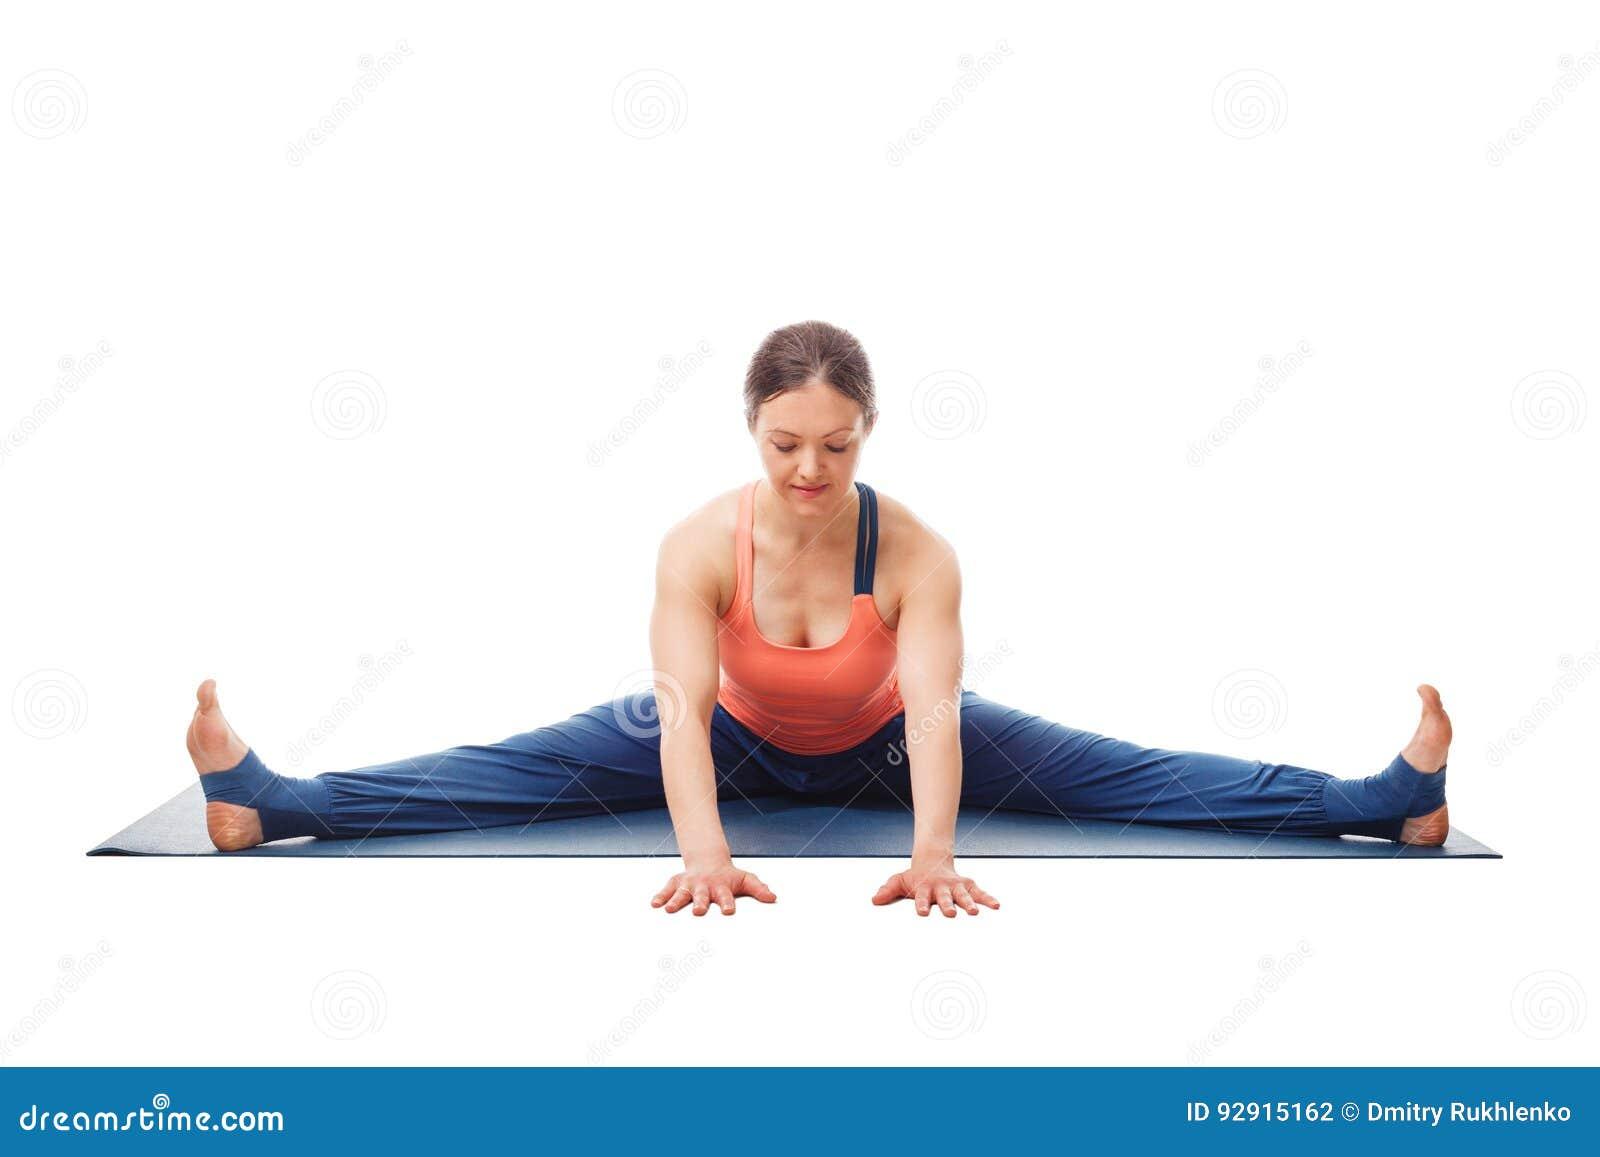 Download Woman Doing Ashtanga Vinyasa Yoga Asana Upavistha Konasana Stock Photo